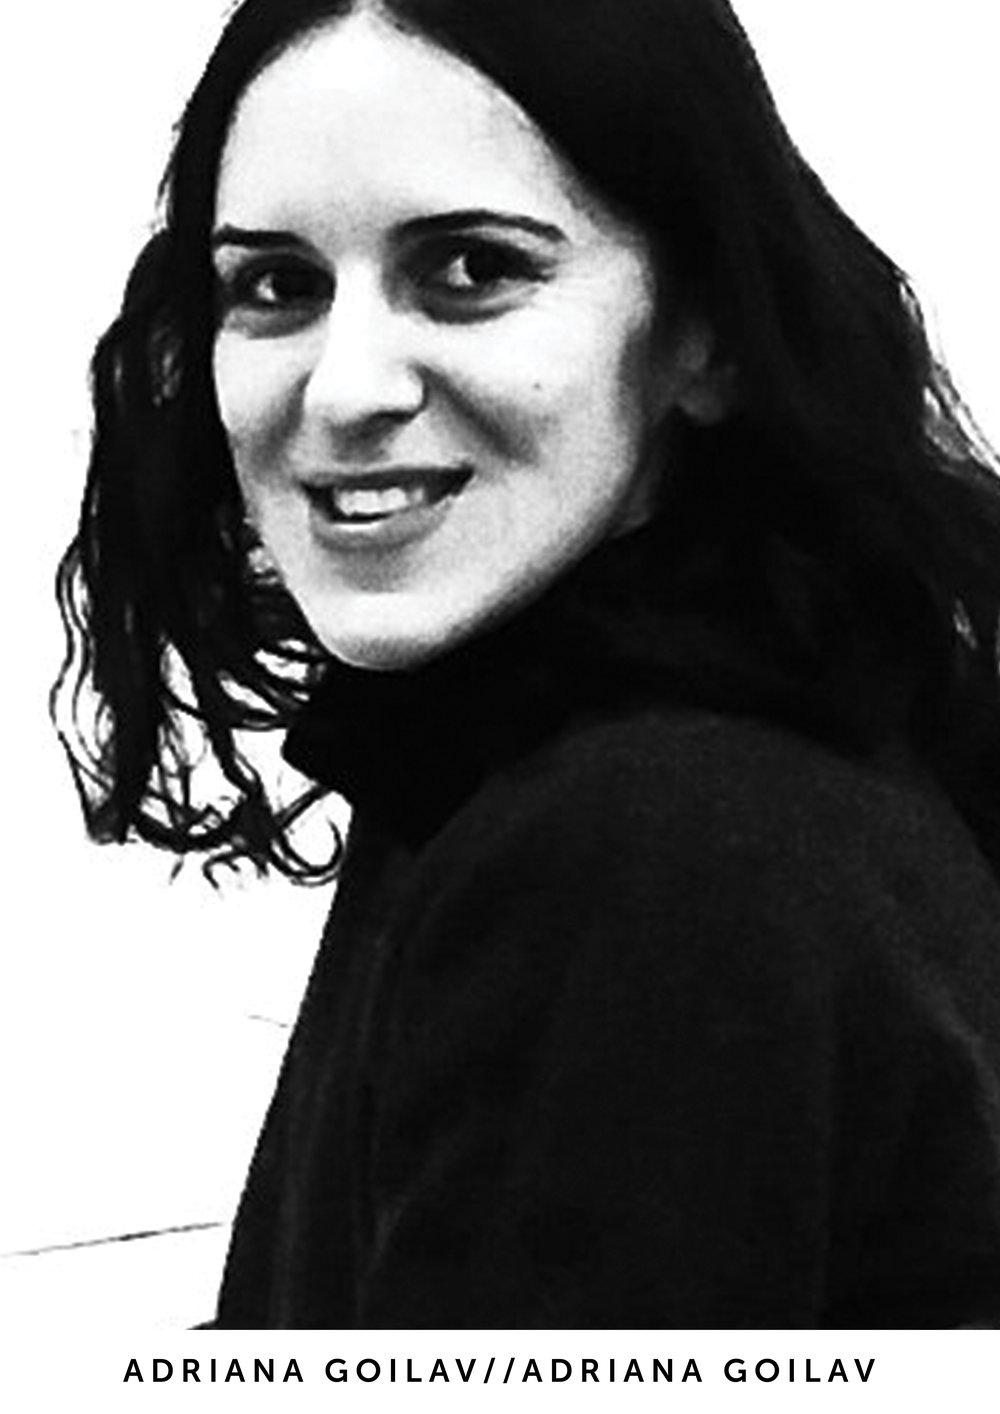 Adriana Goilav